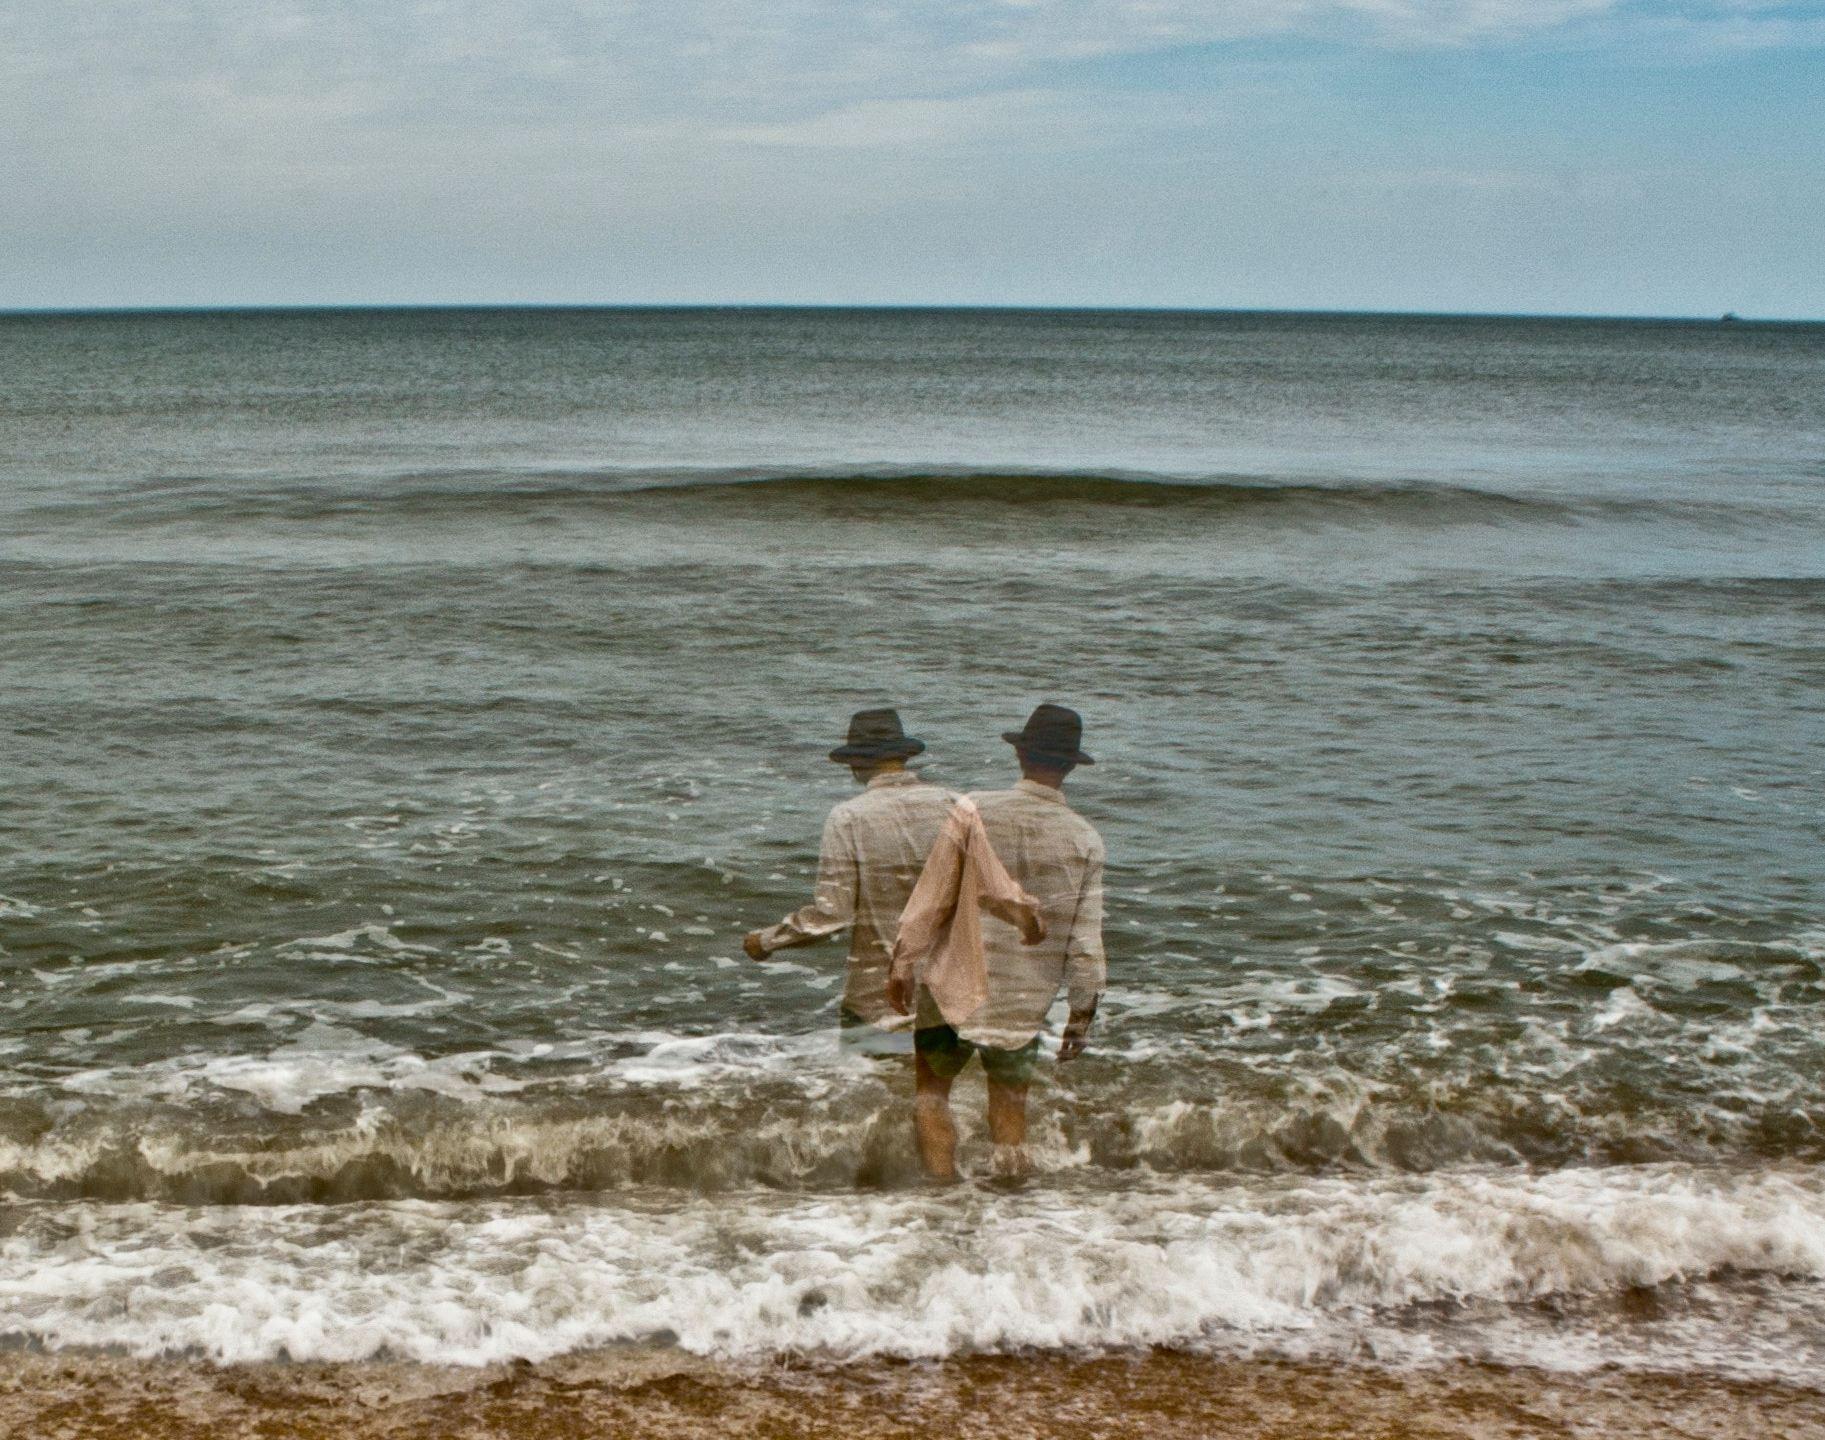 29 Florida Based Photographers That Make Us Wish It Were Summer, Always